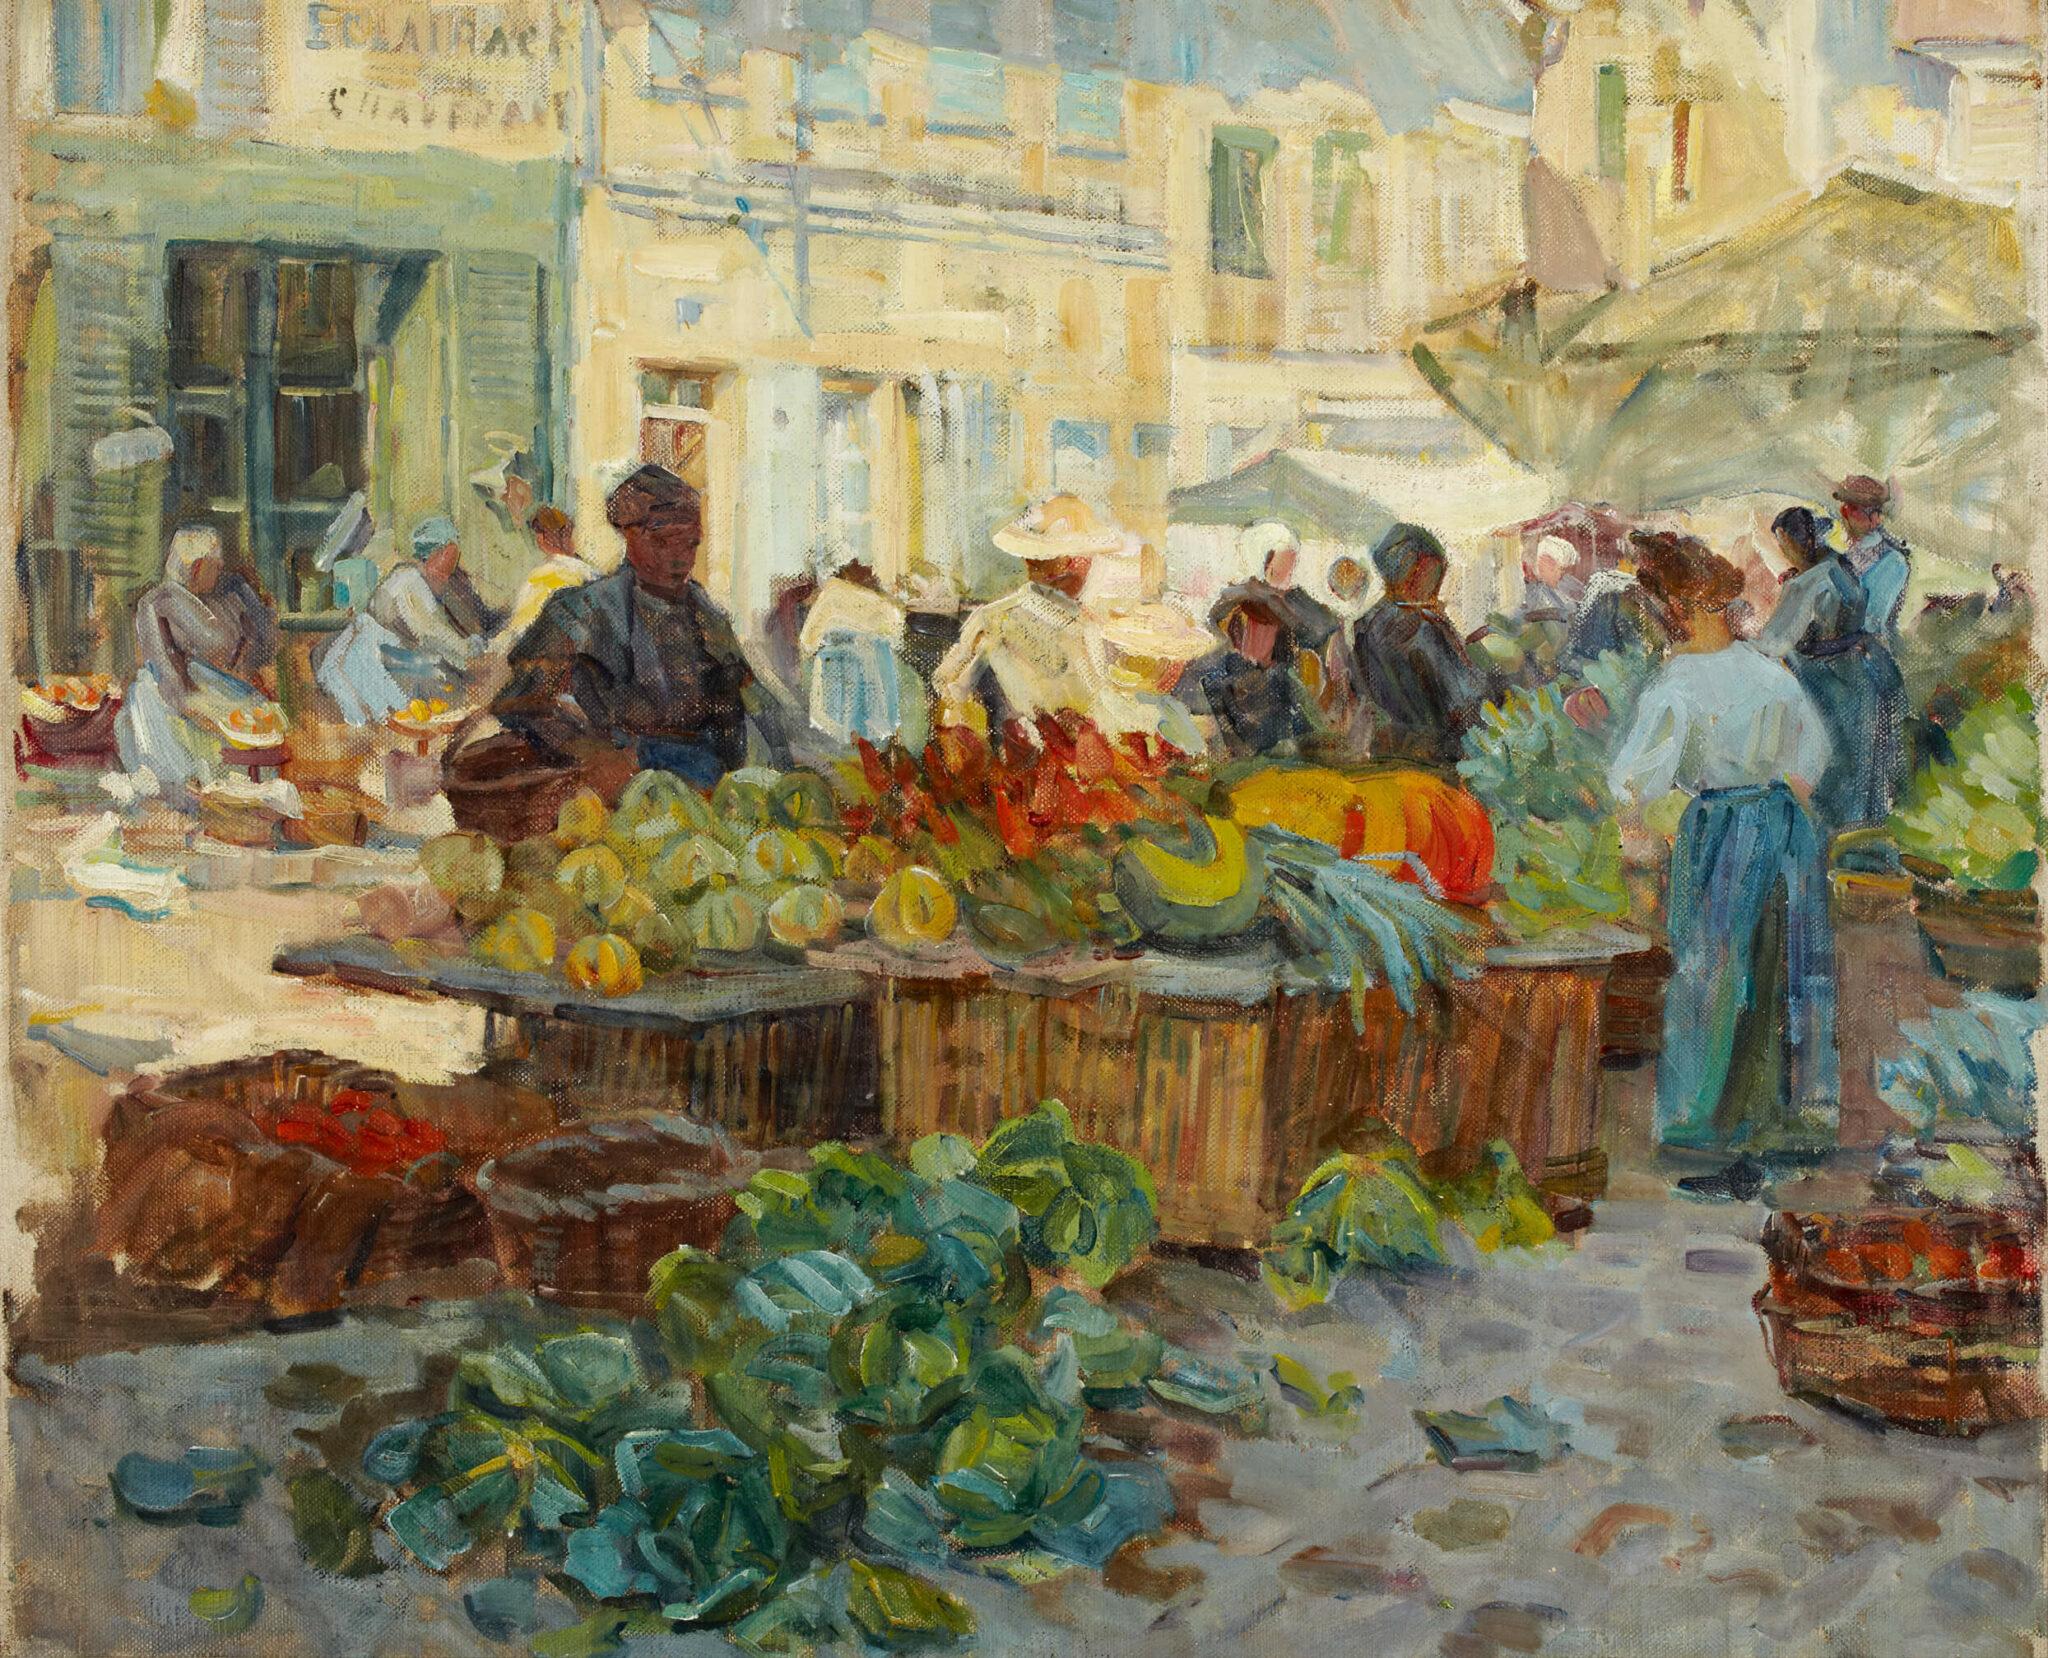 Helen McNicoll, Marketplace, 1910